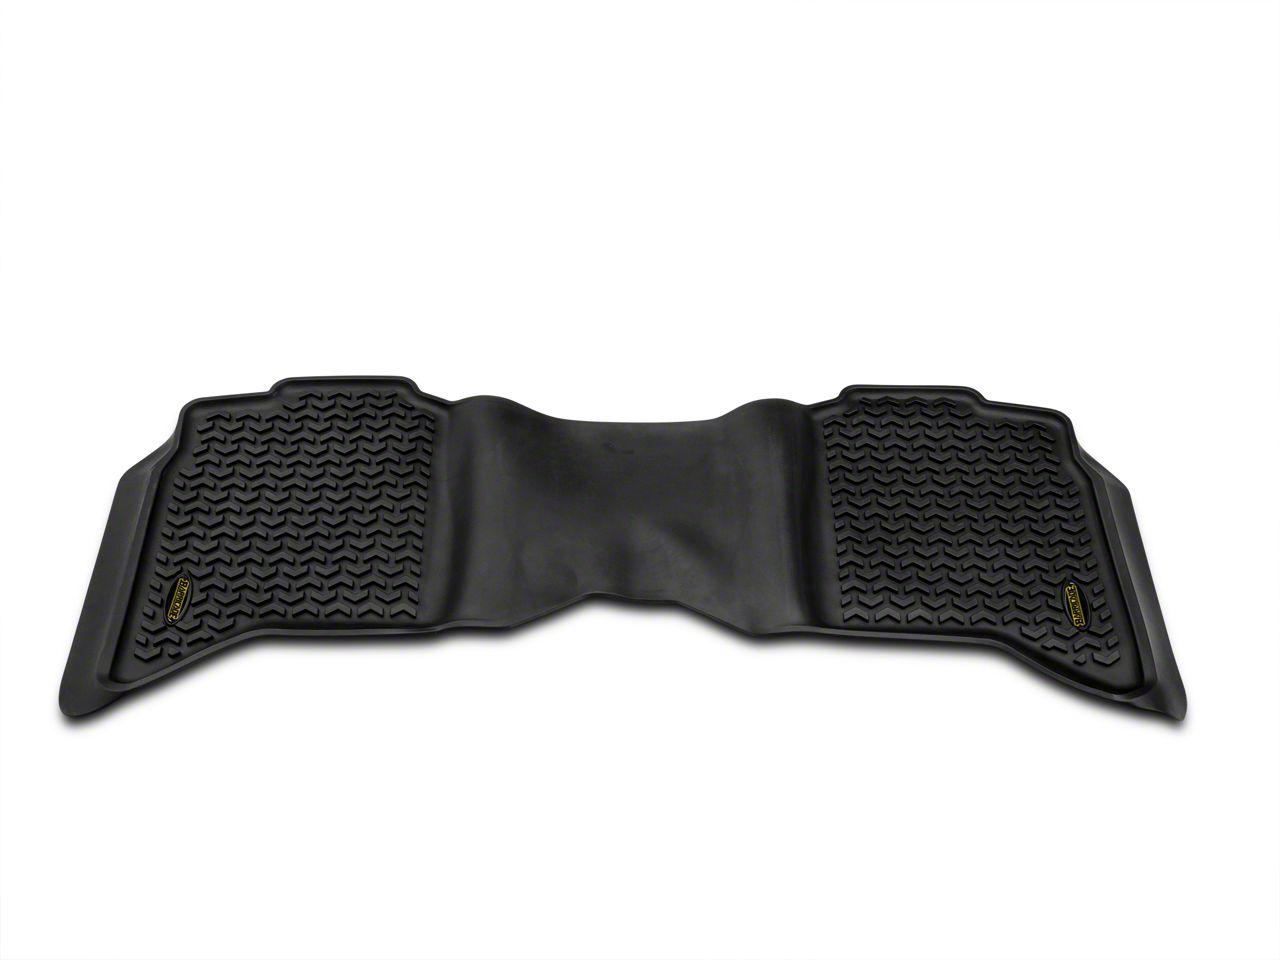 Barricade Rear Floor Mat - Black (09-18 RAM 1500 Crew Cab)